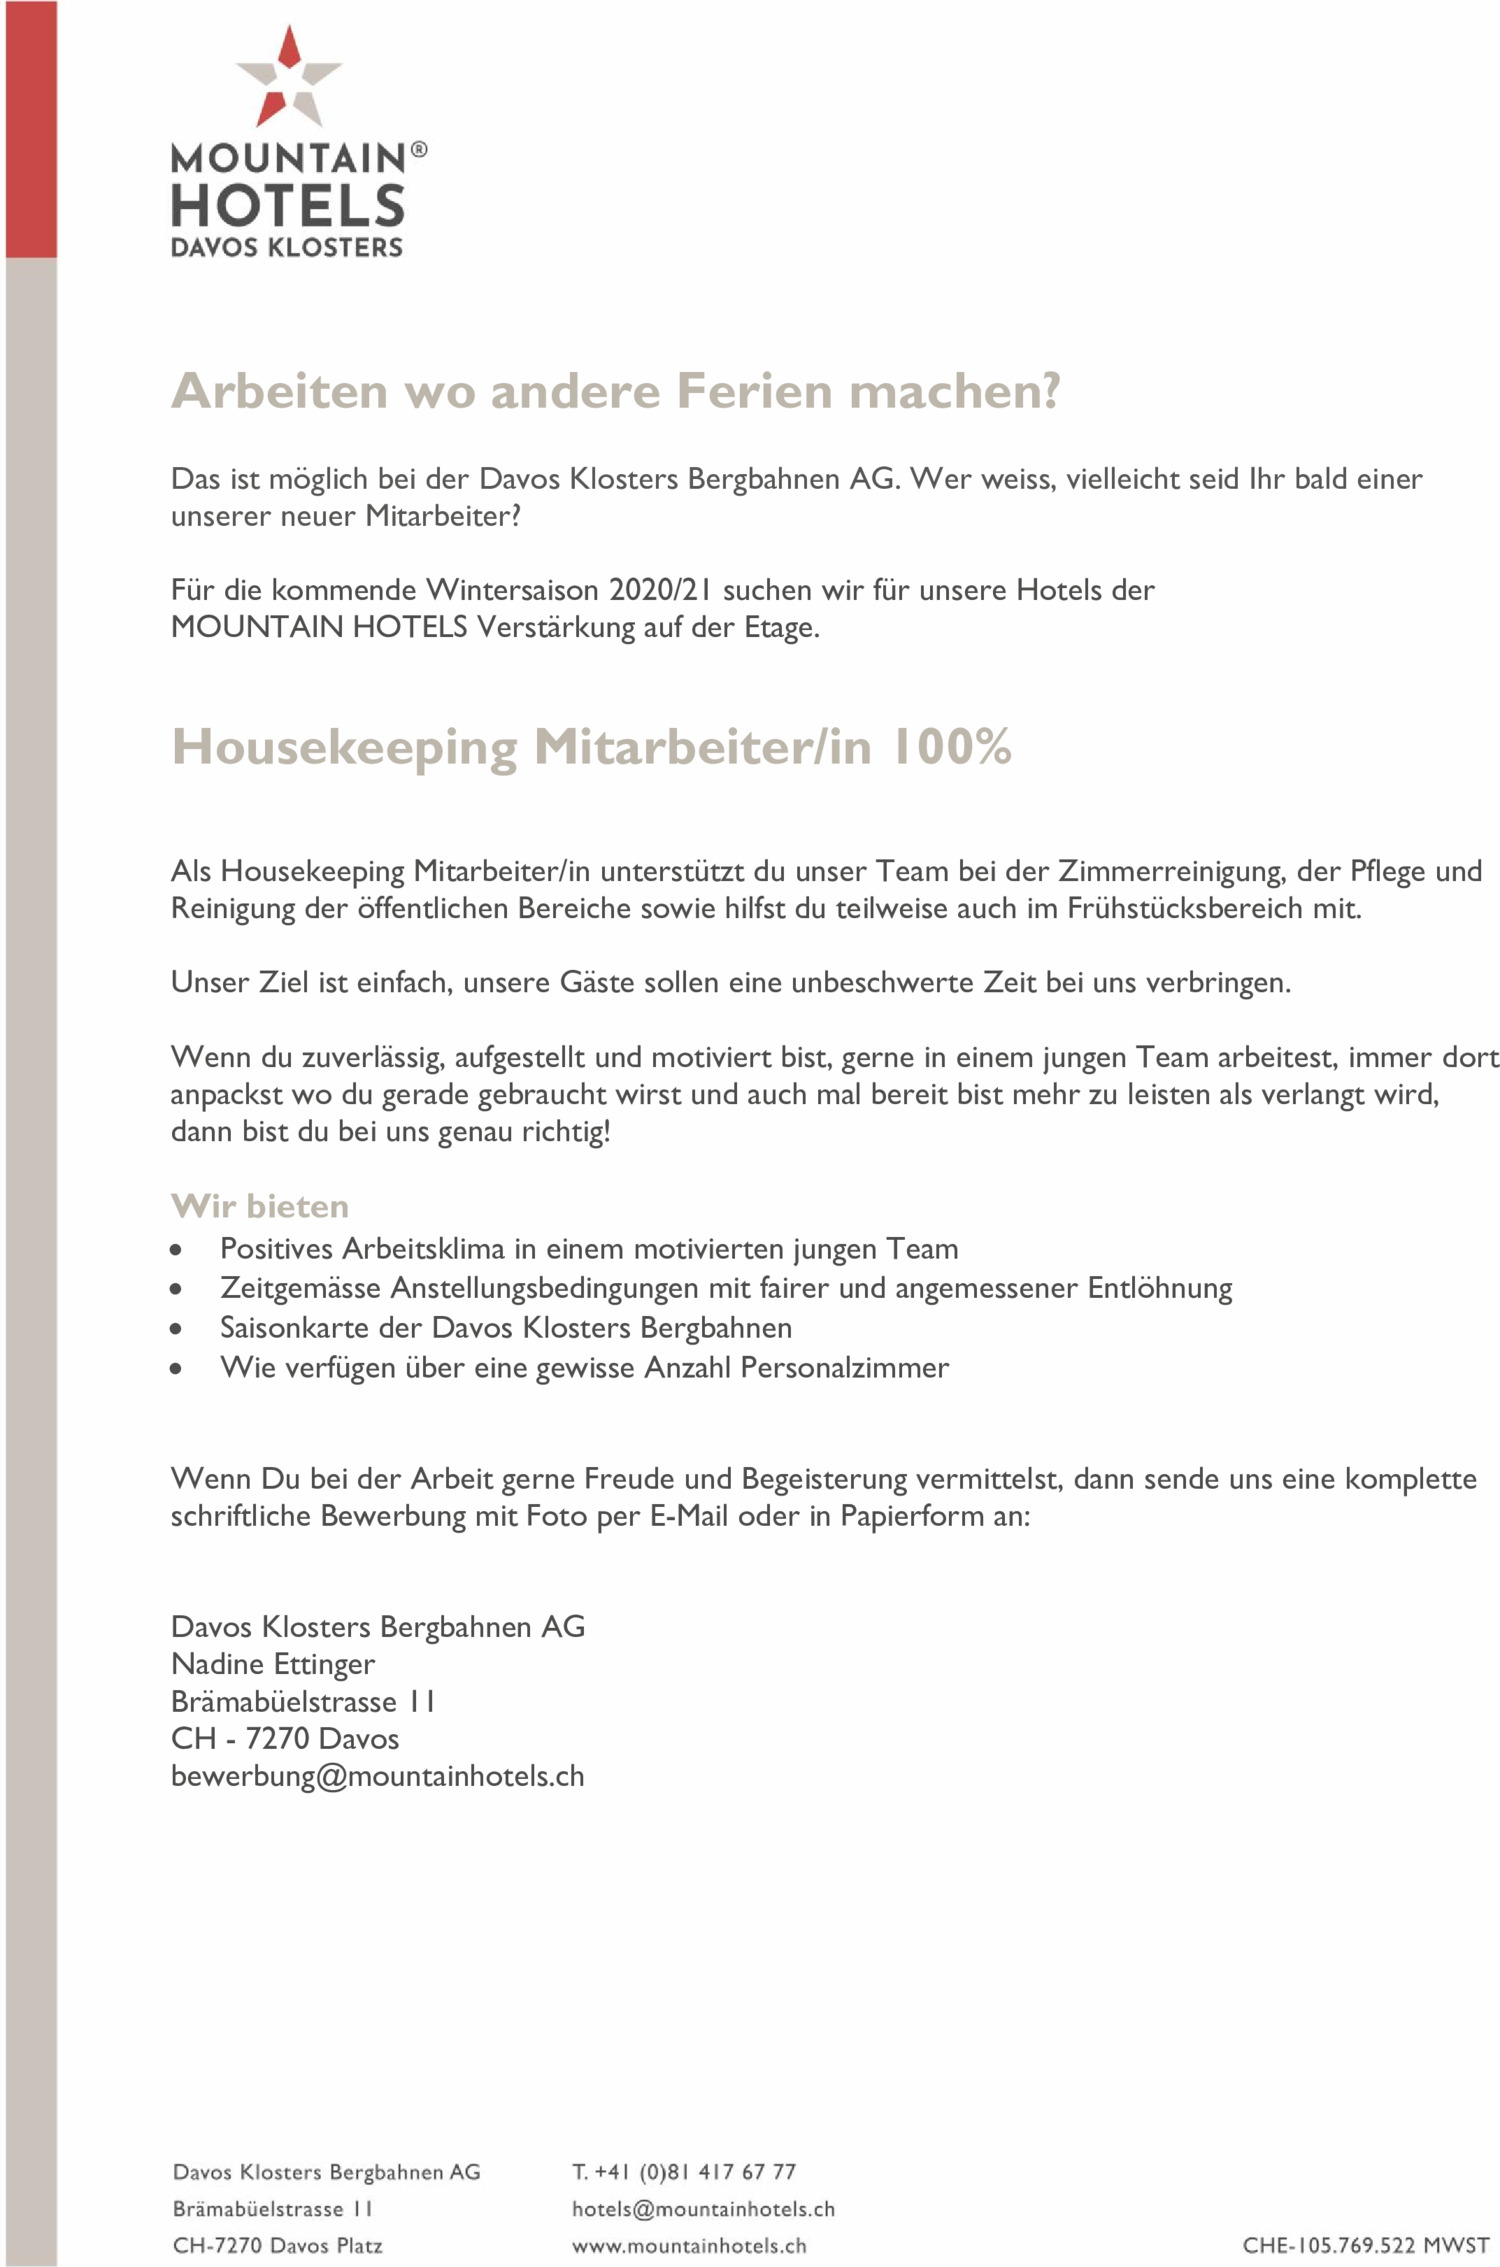 Inserat Davos Klosters Bergbahnen AG: Housekeeping Mitarbeiter/in 100%